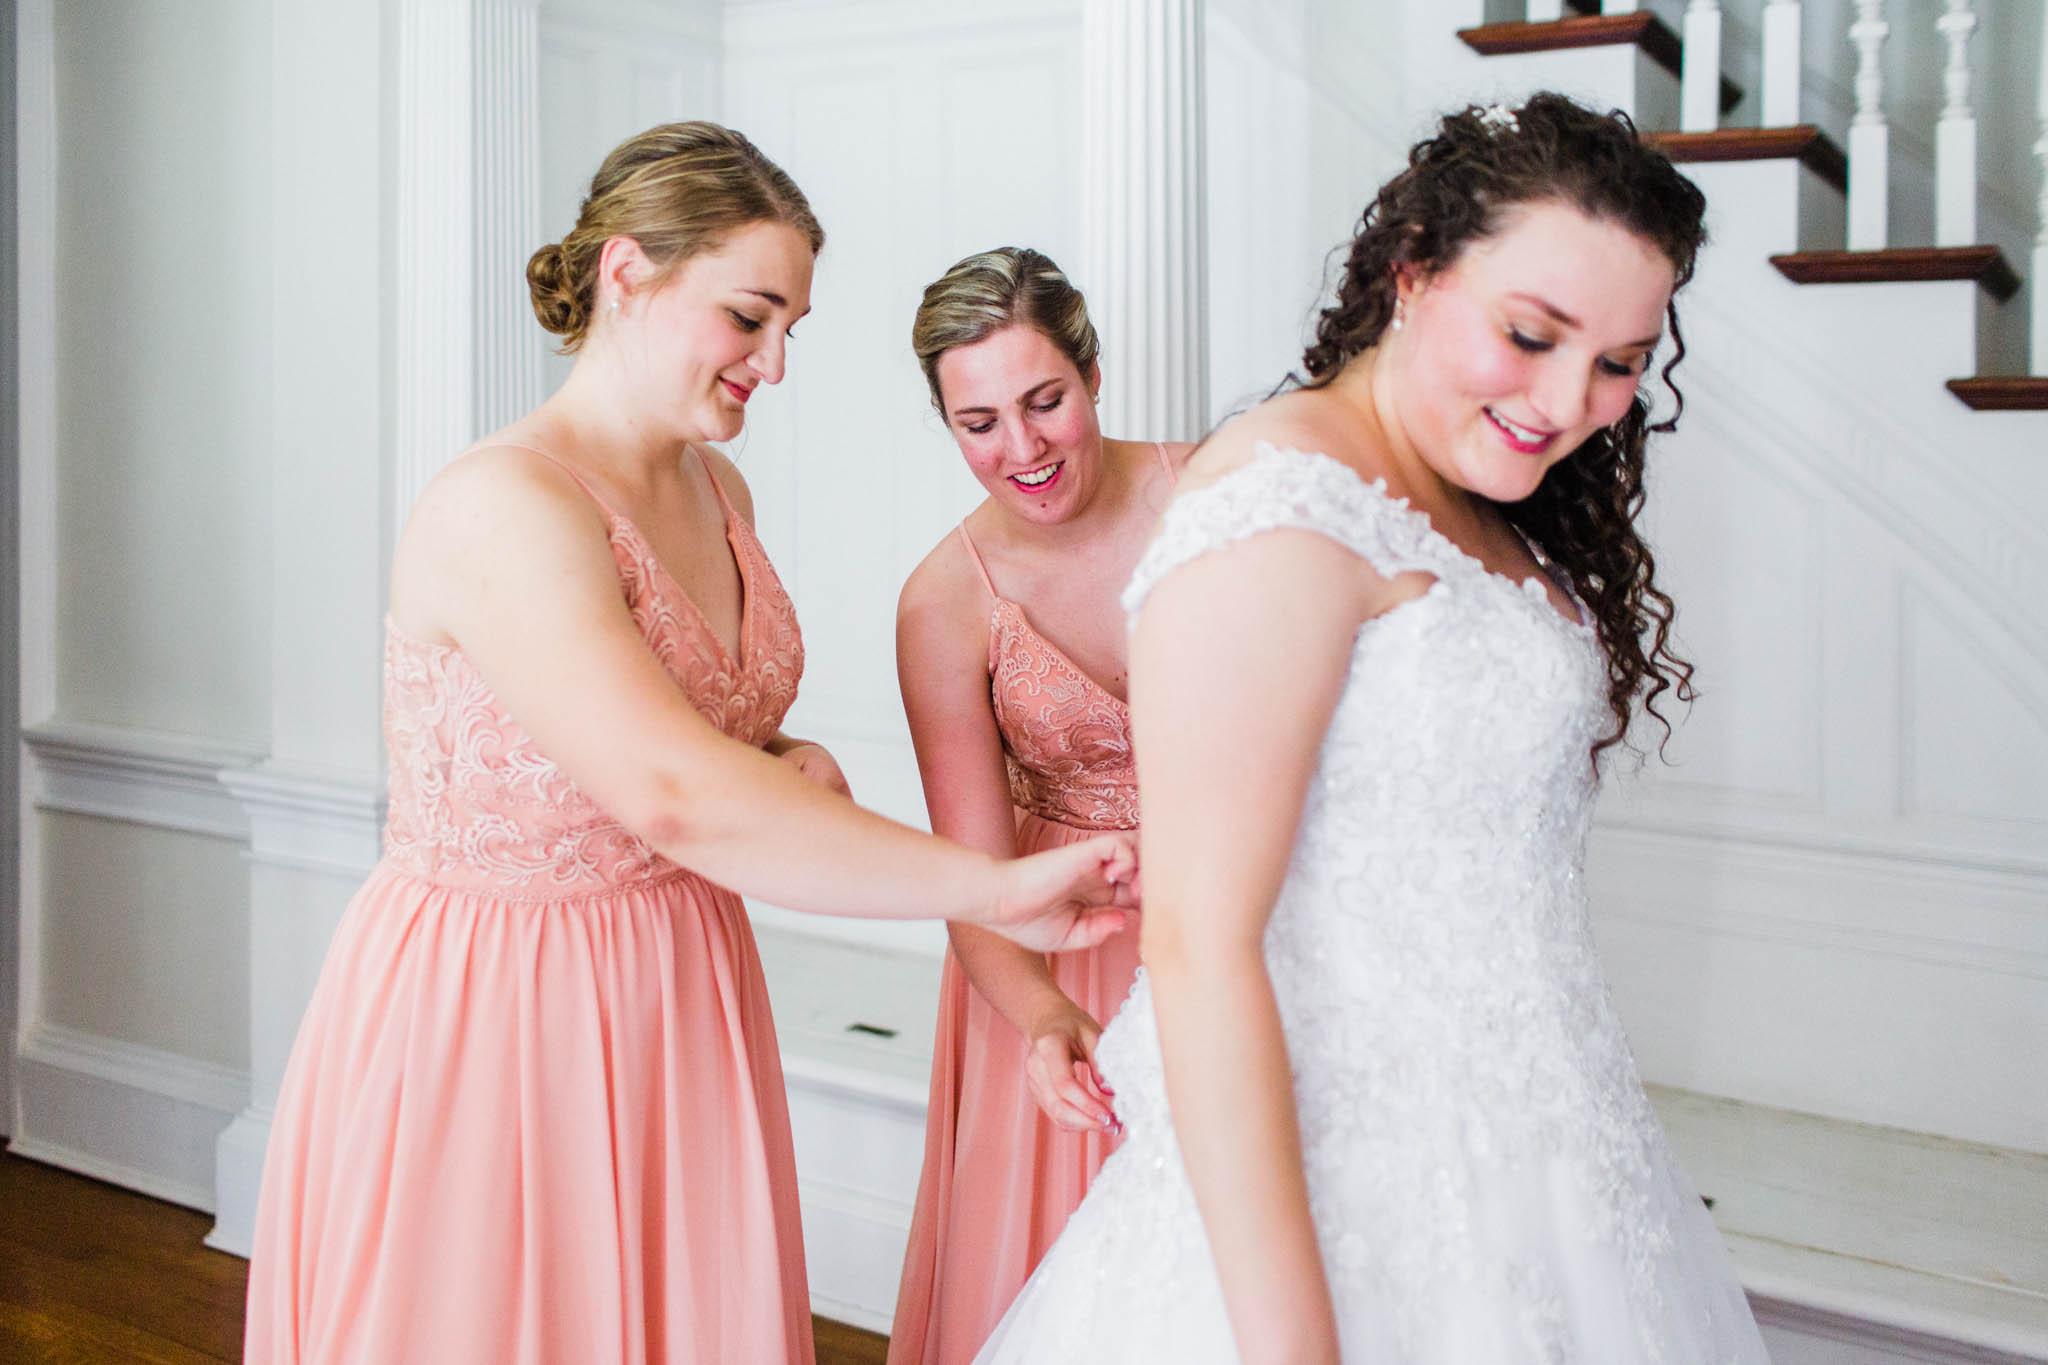 lynchburg-virginia-wedding-photographer-42.jpg